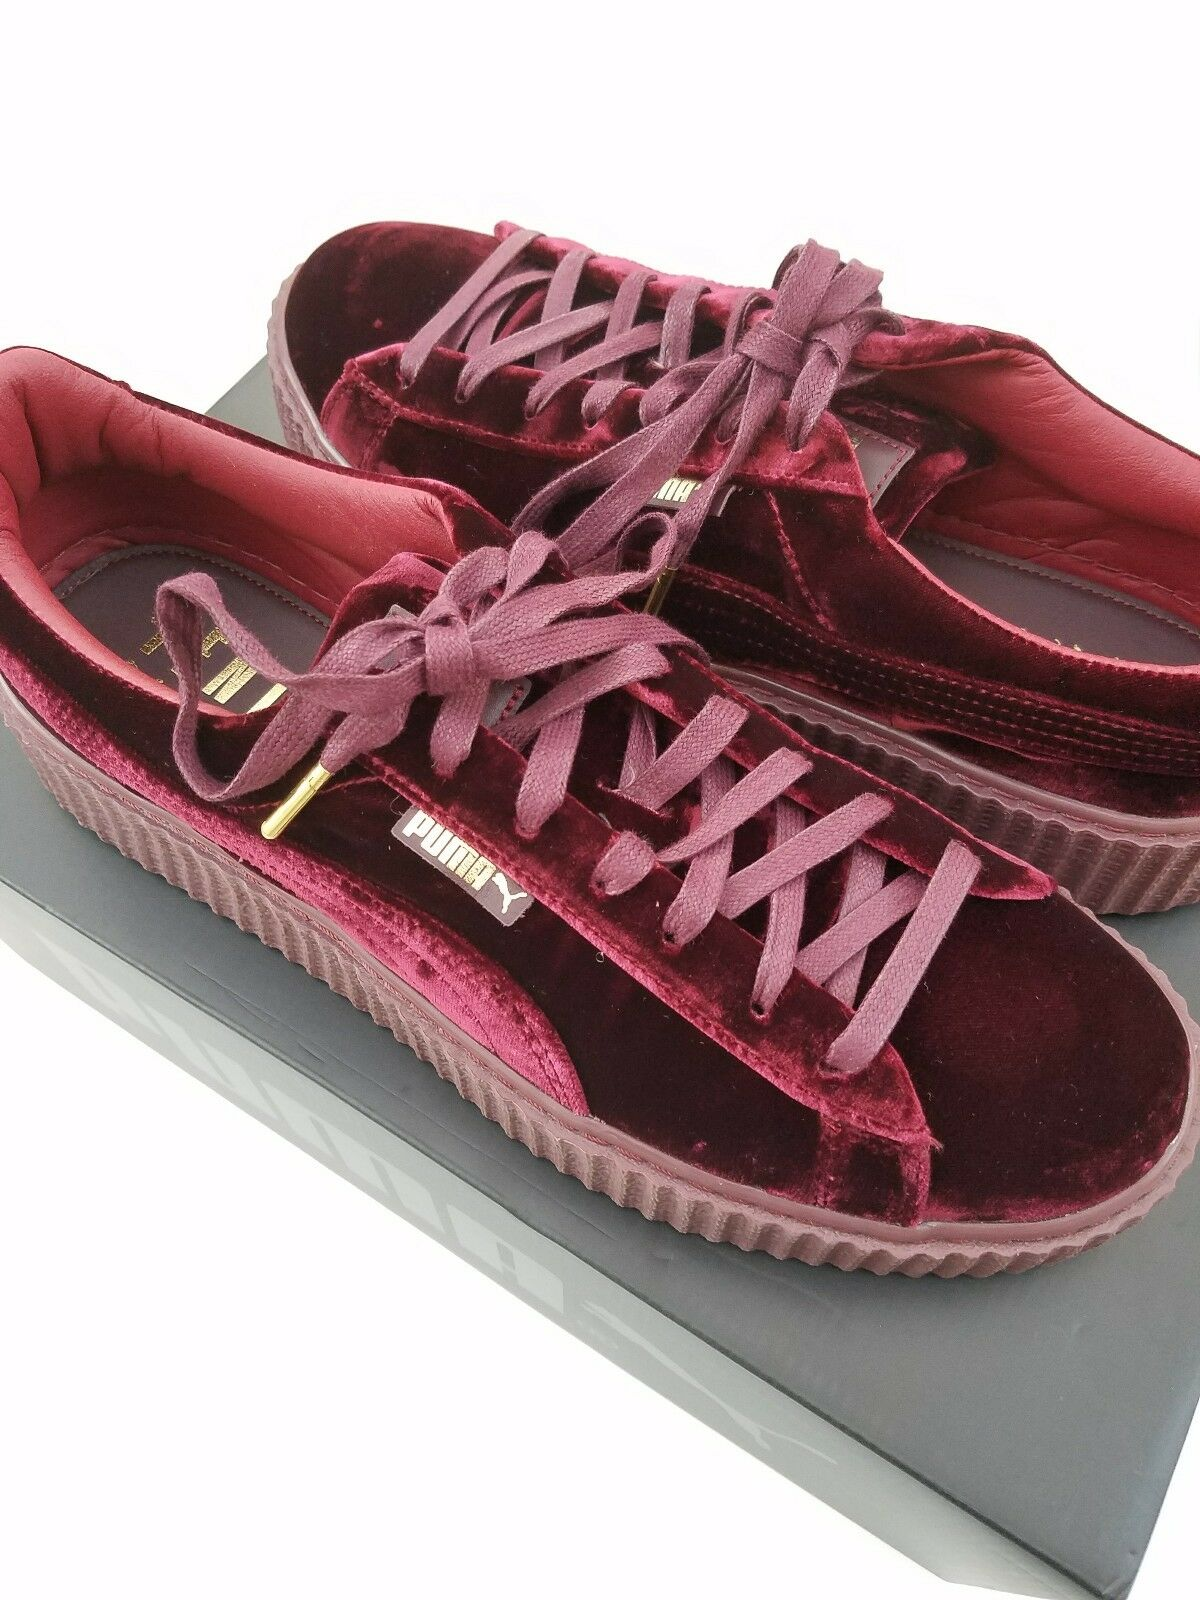 Puma FENTY by Rihanna Creepers shoes Velvet purple Royal Purple Mens 12